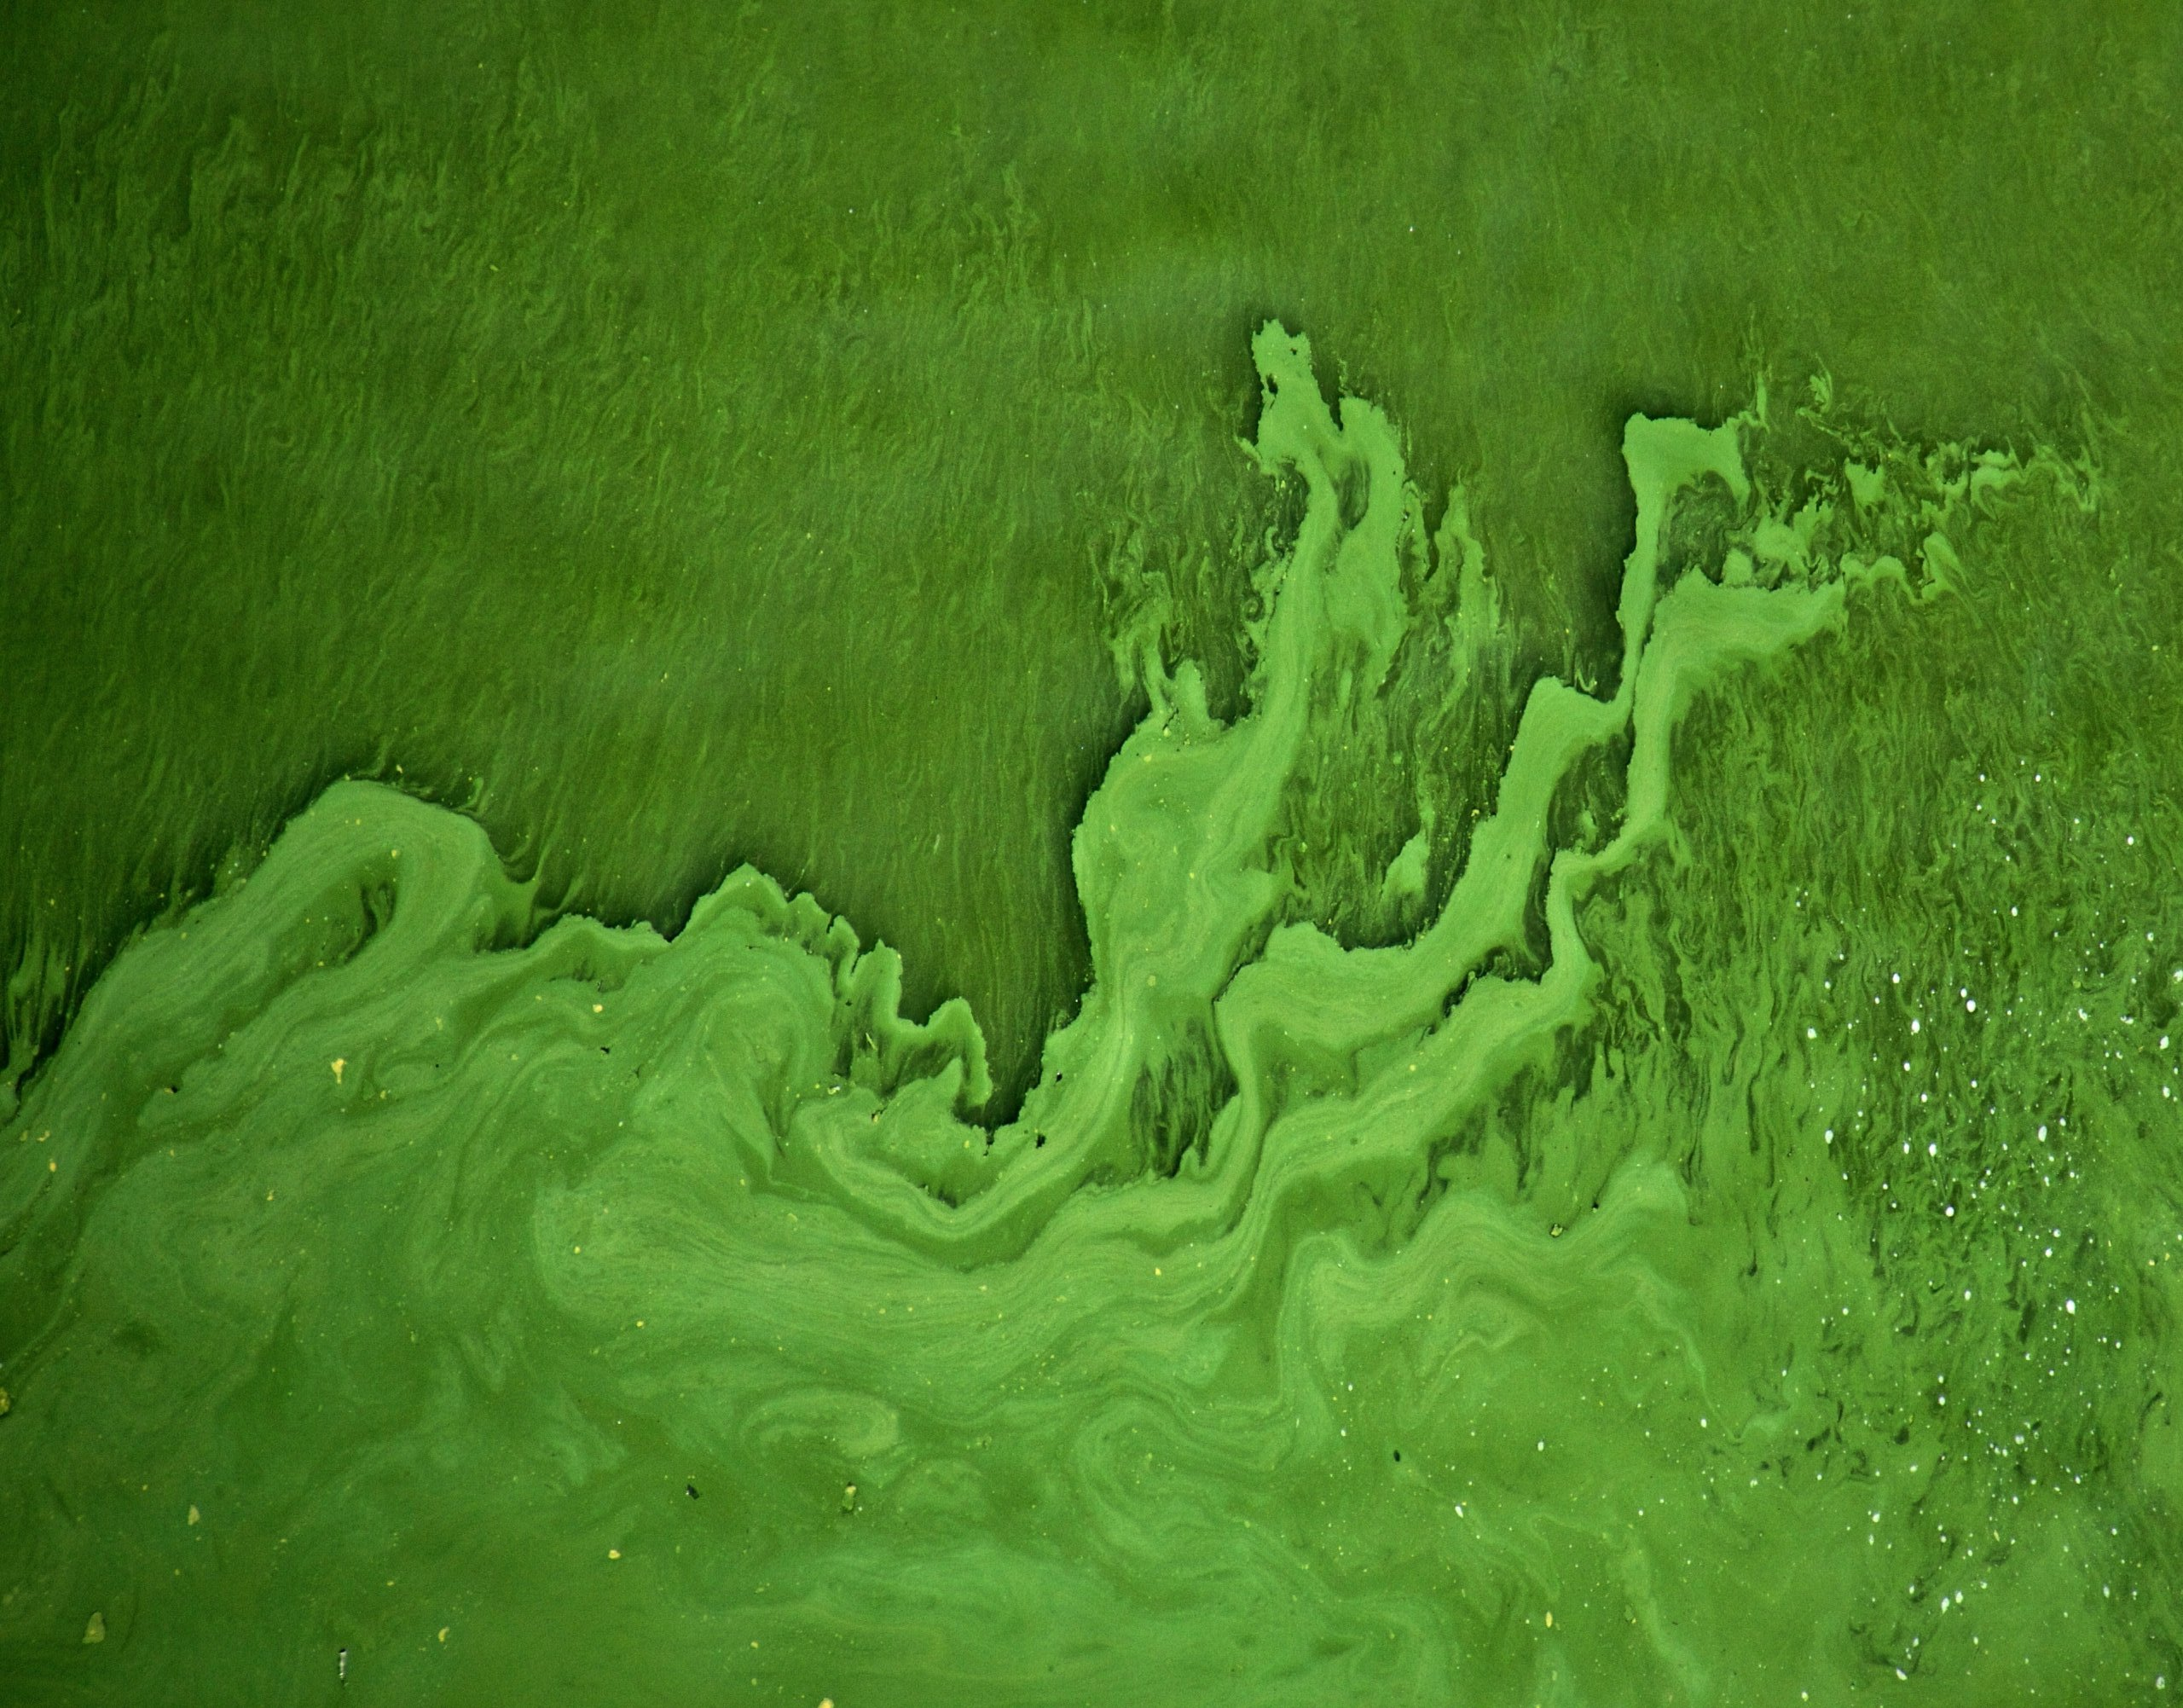 Green algae water